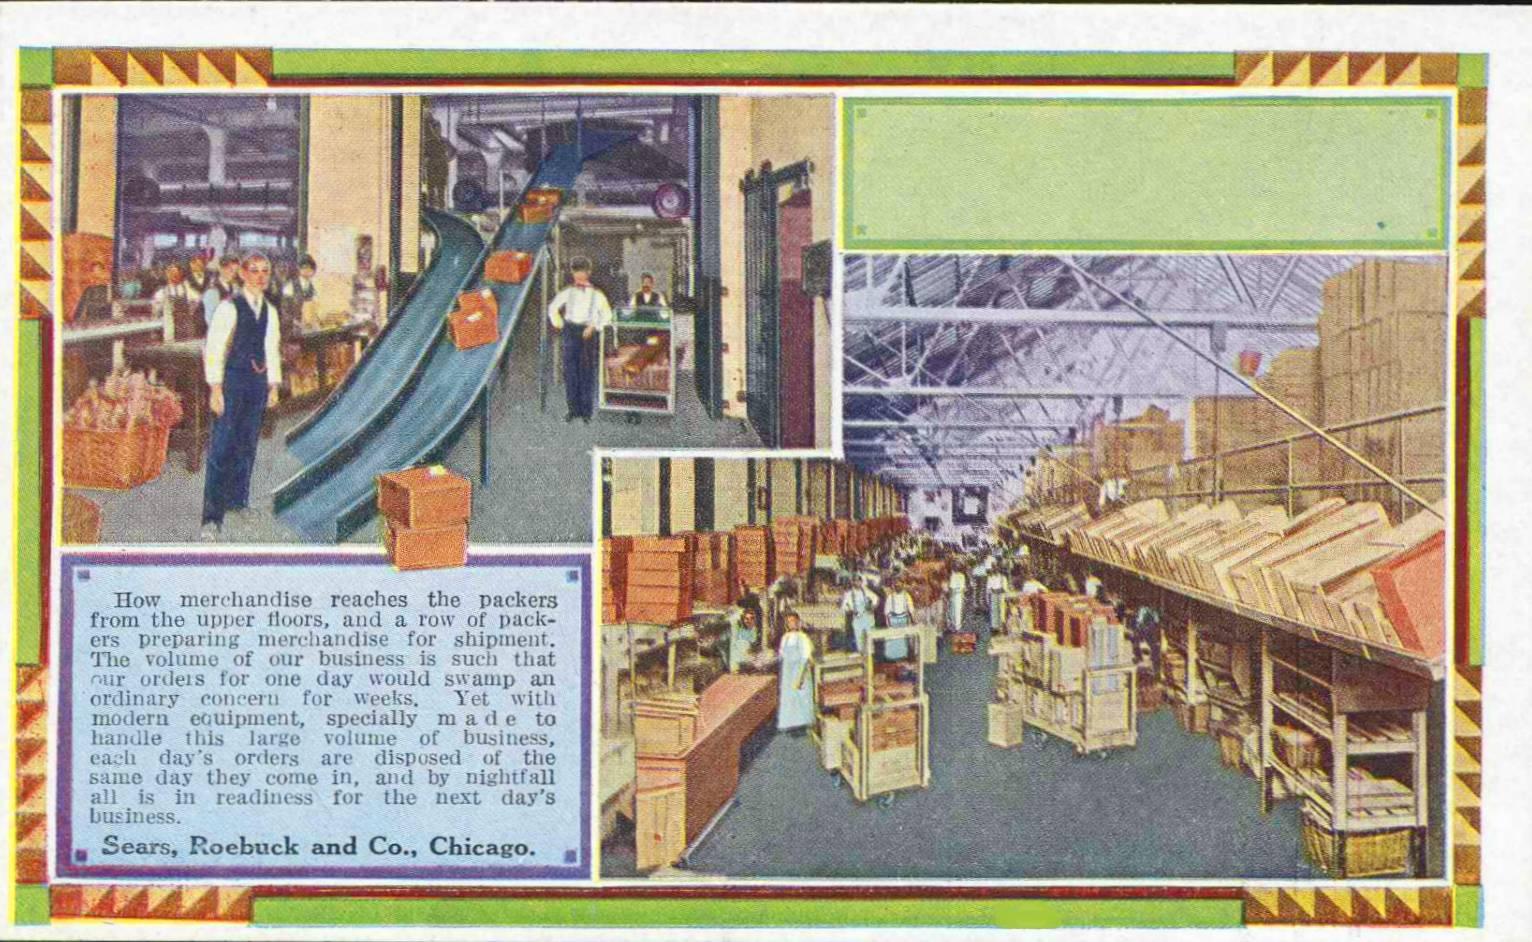 Sears Merchandise